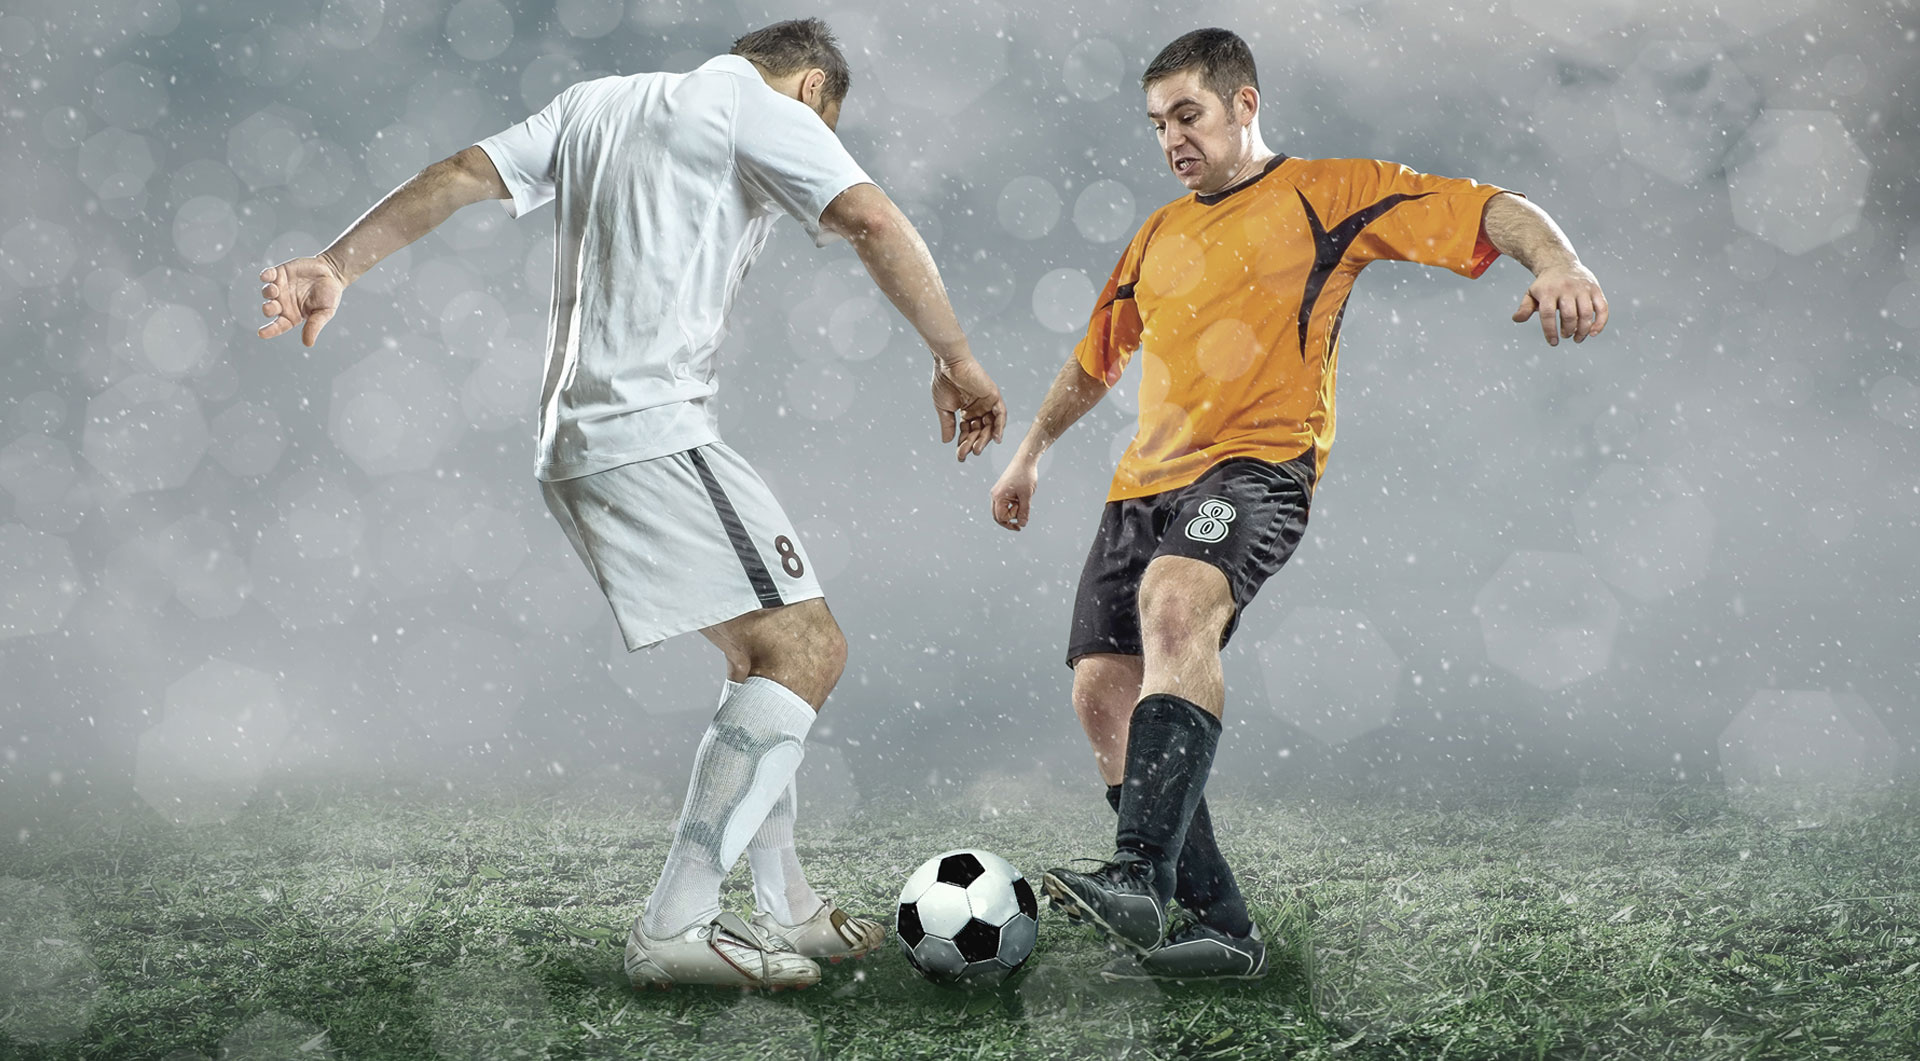 watch-a.-kerber-vs-k.-pervak-1st-round-online